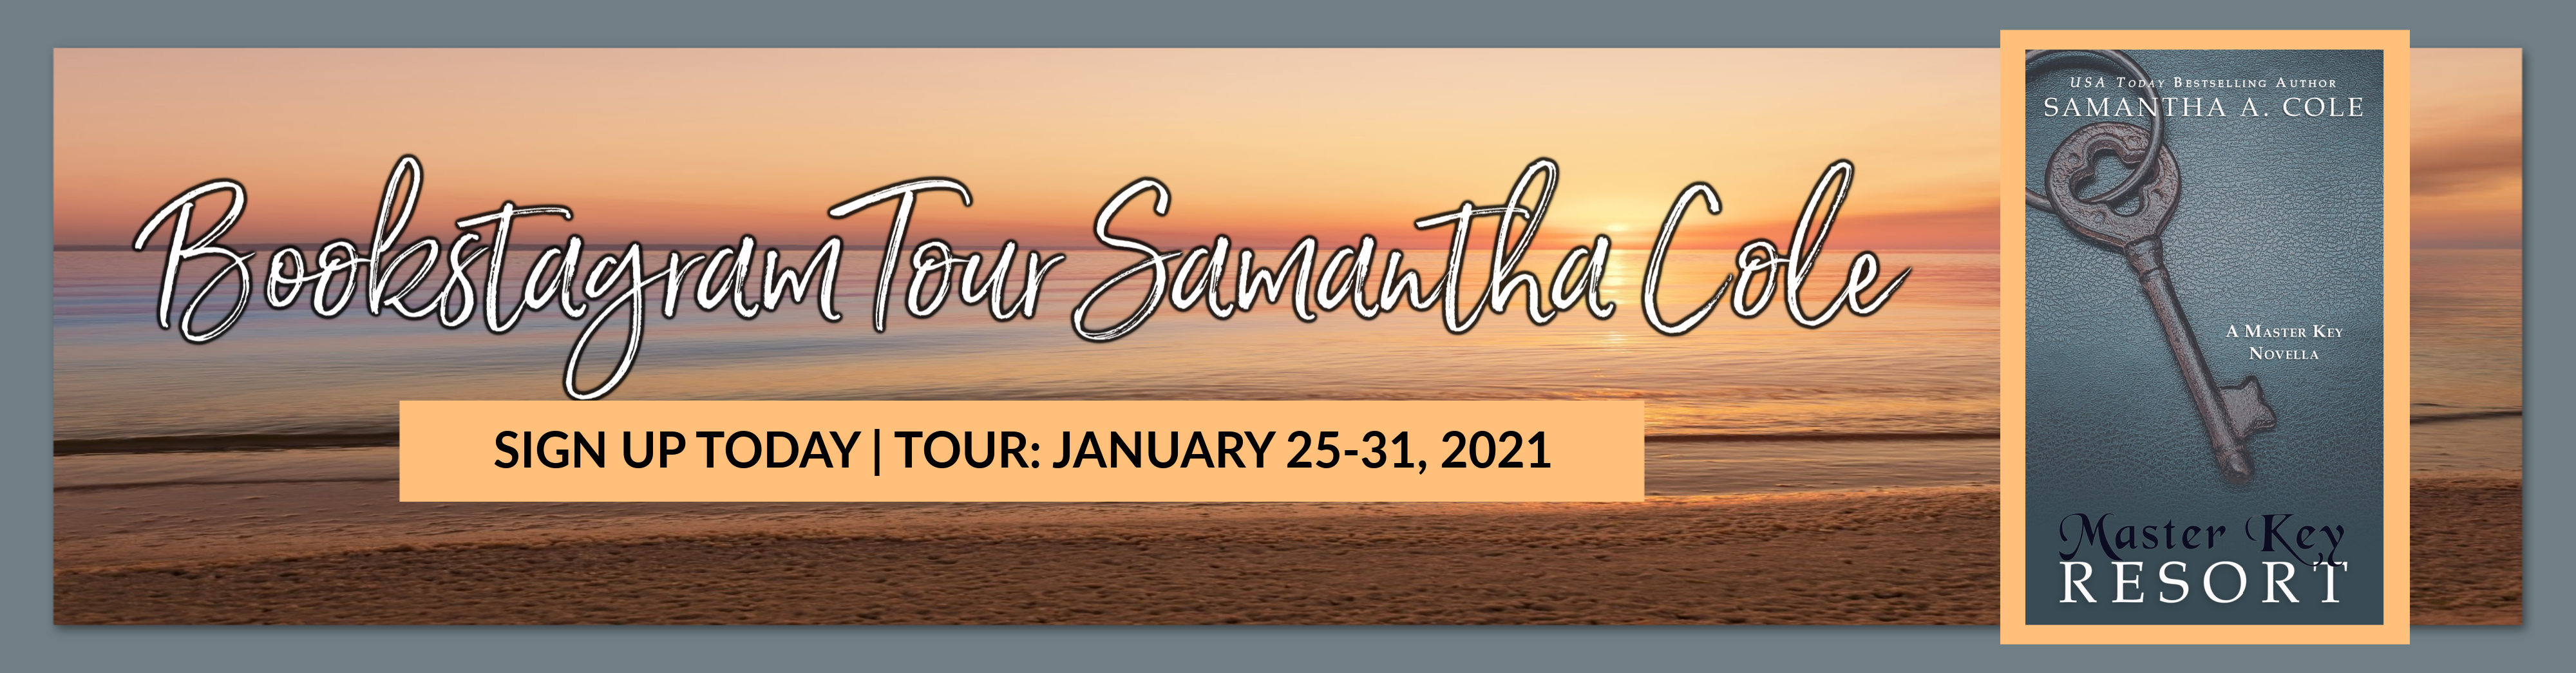 BOOKSTAGRAM TOUR SAMANTHA COLE